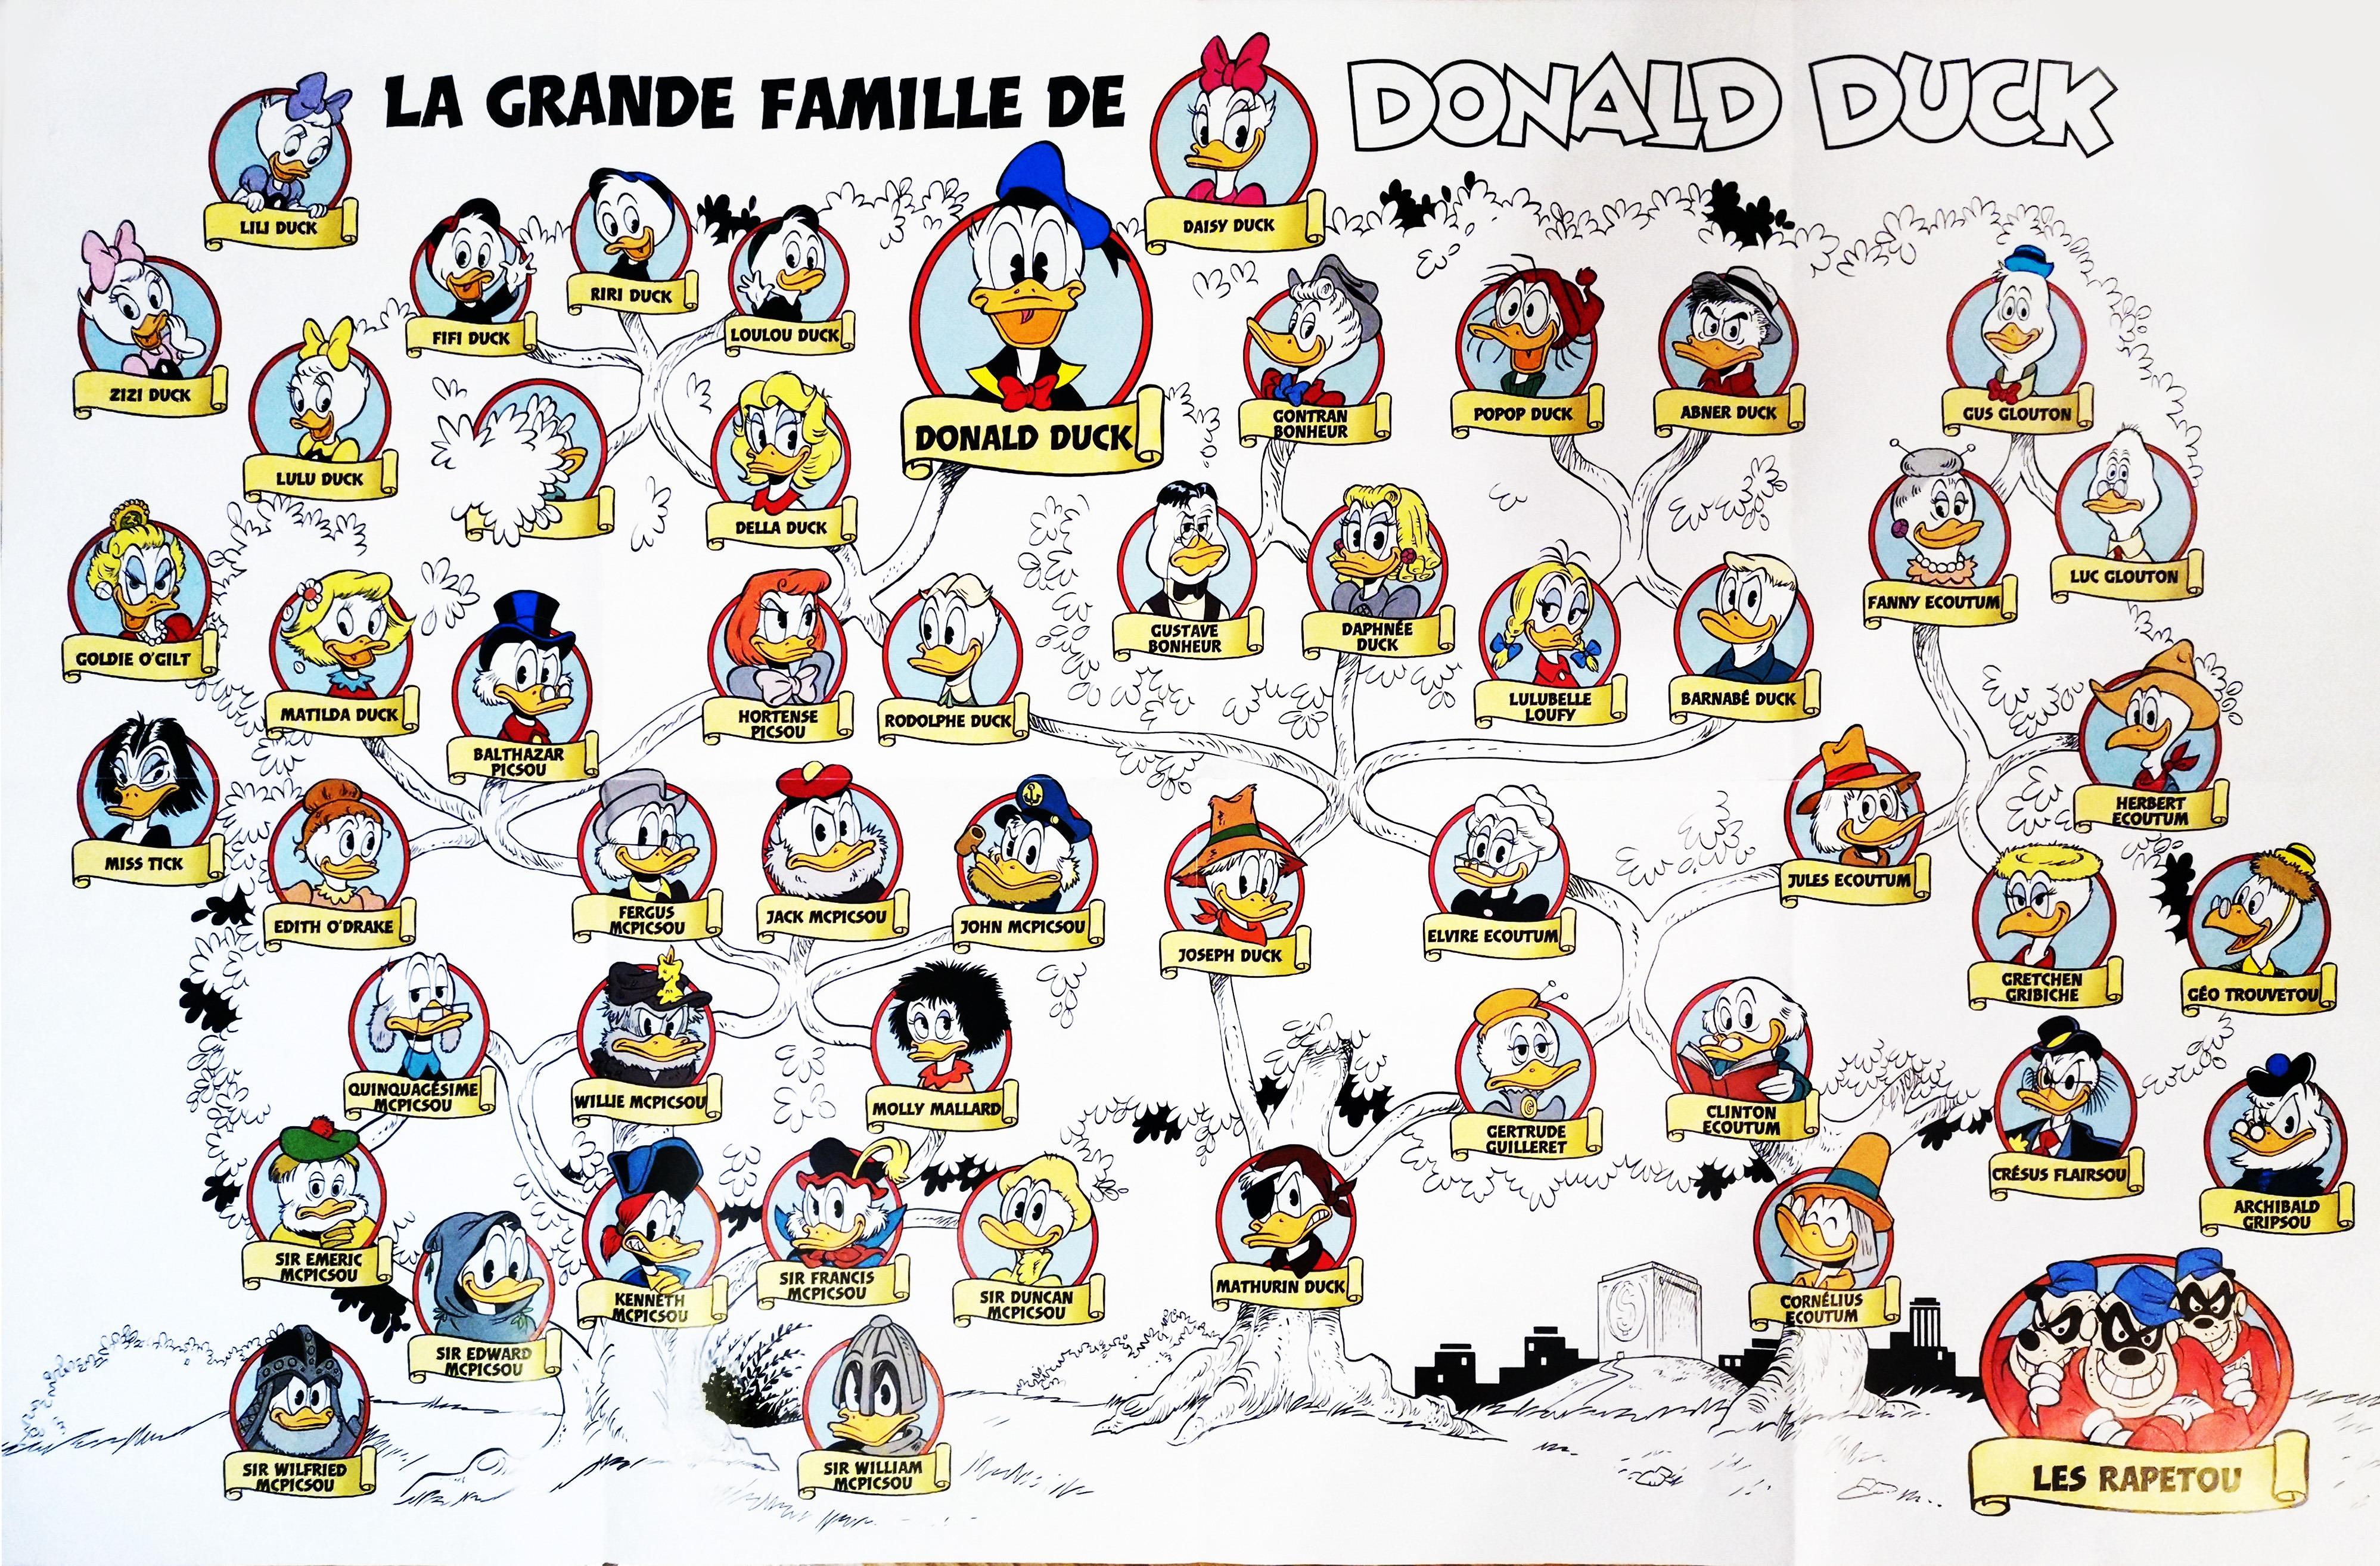 Donald Duck's Big Family